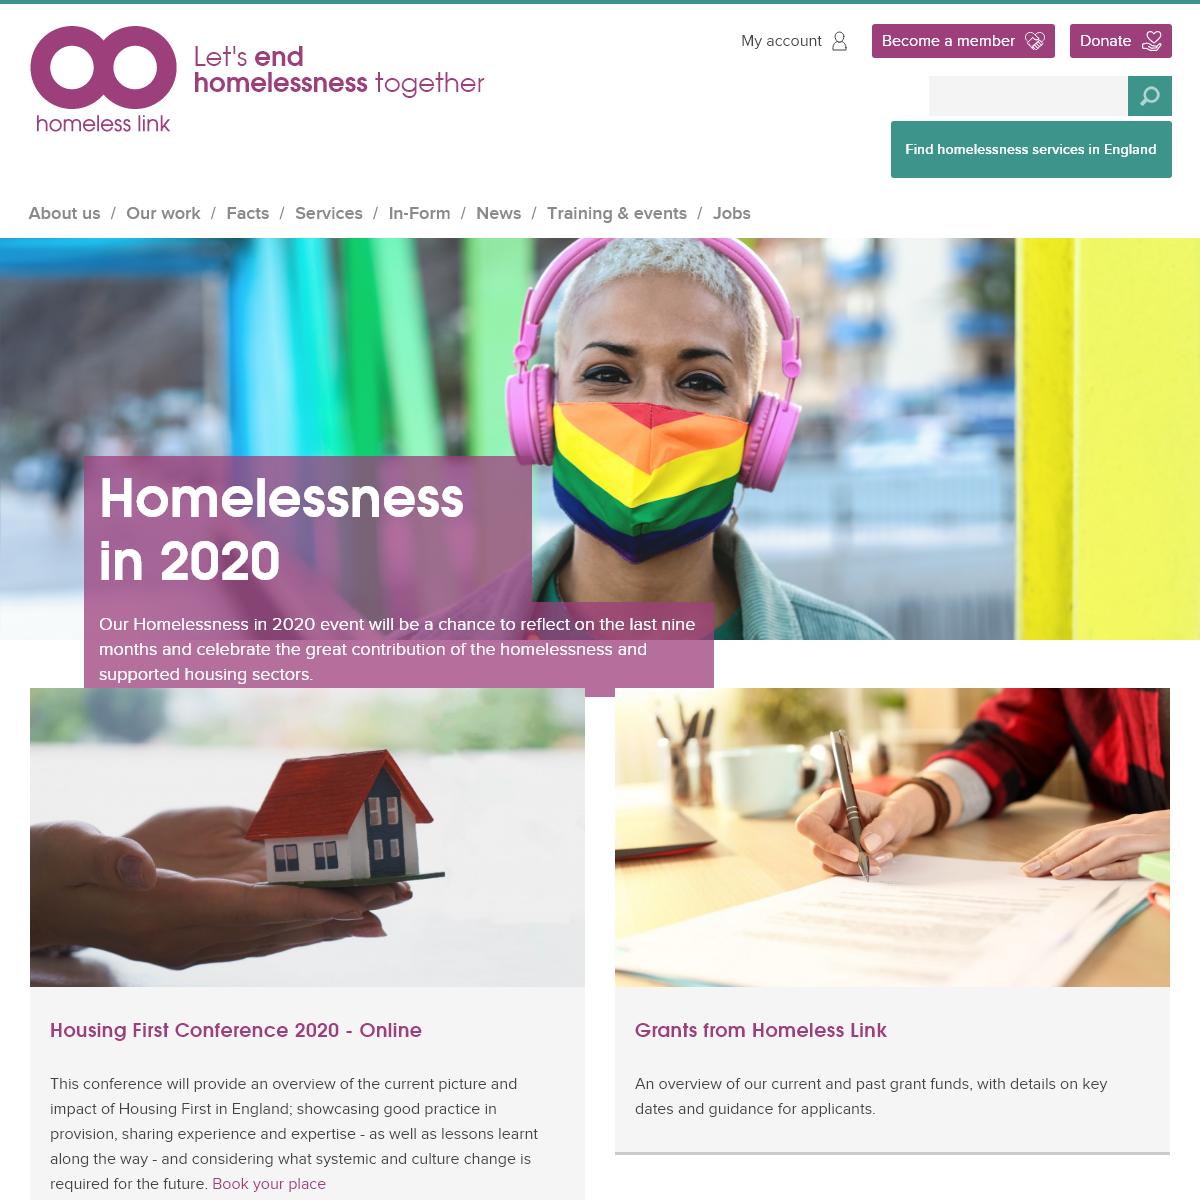 Homeless Link - Let`s end homelessness together